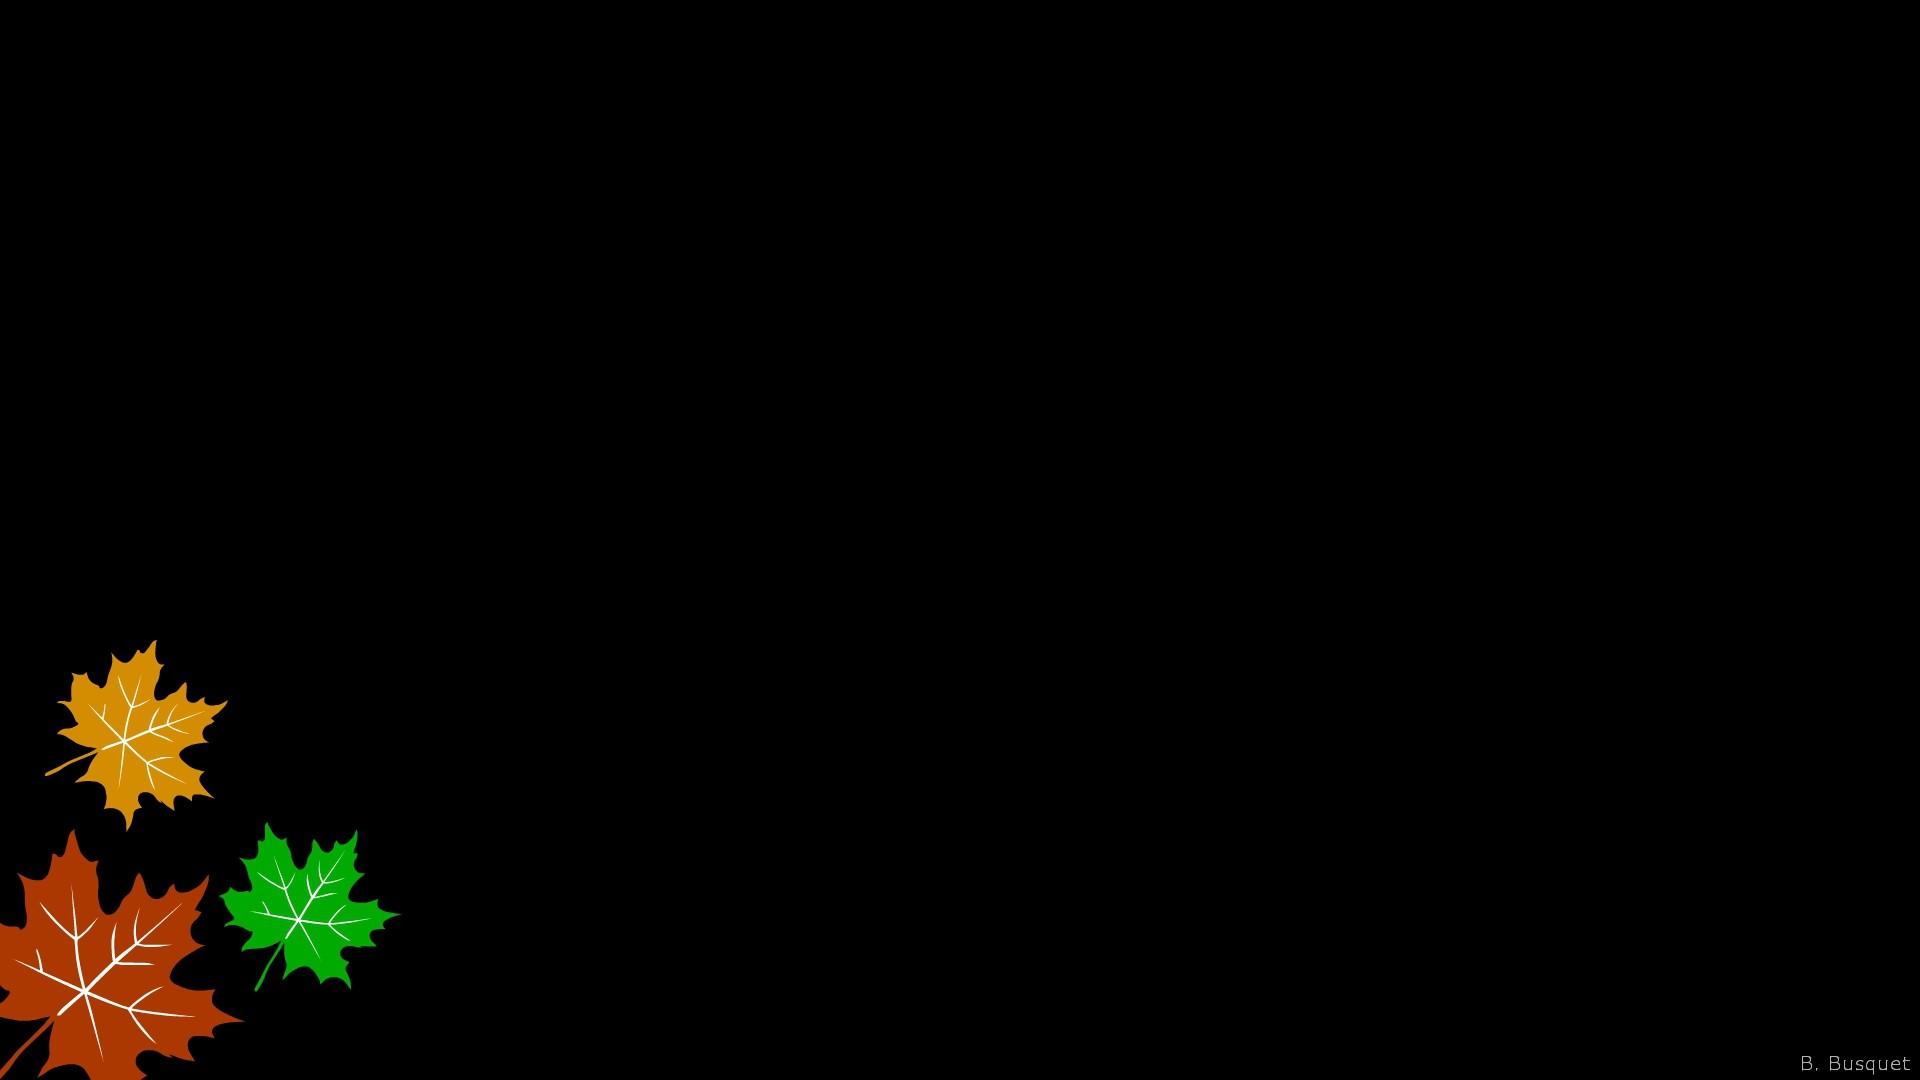 Download 700+ Wallpaper Black Simple HD